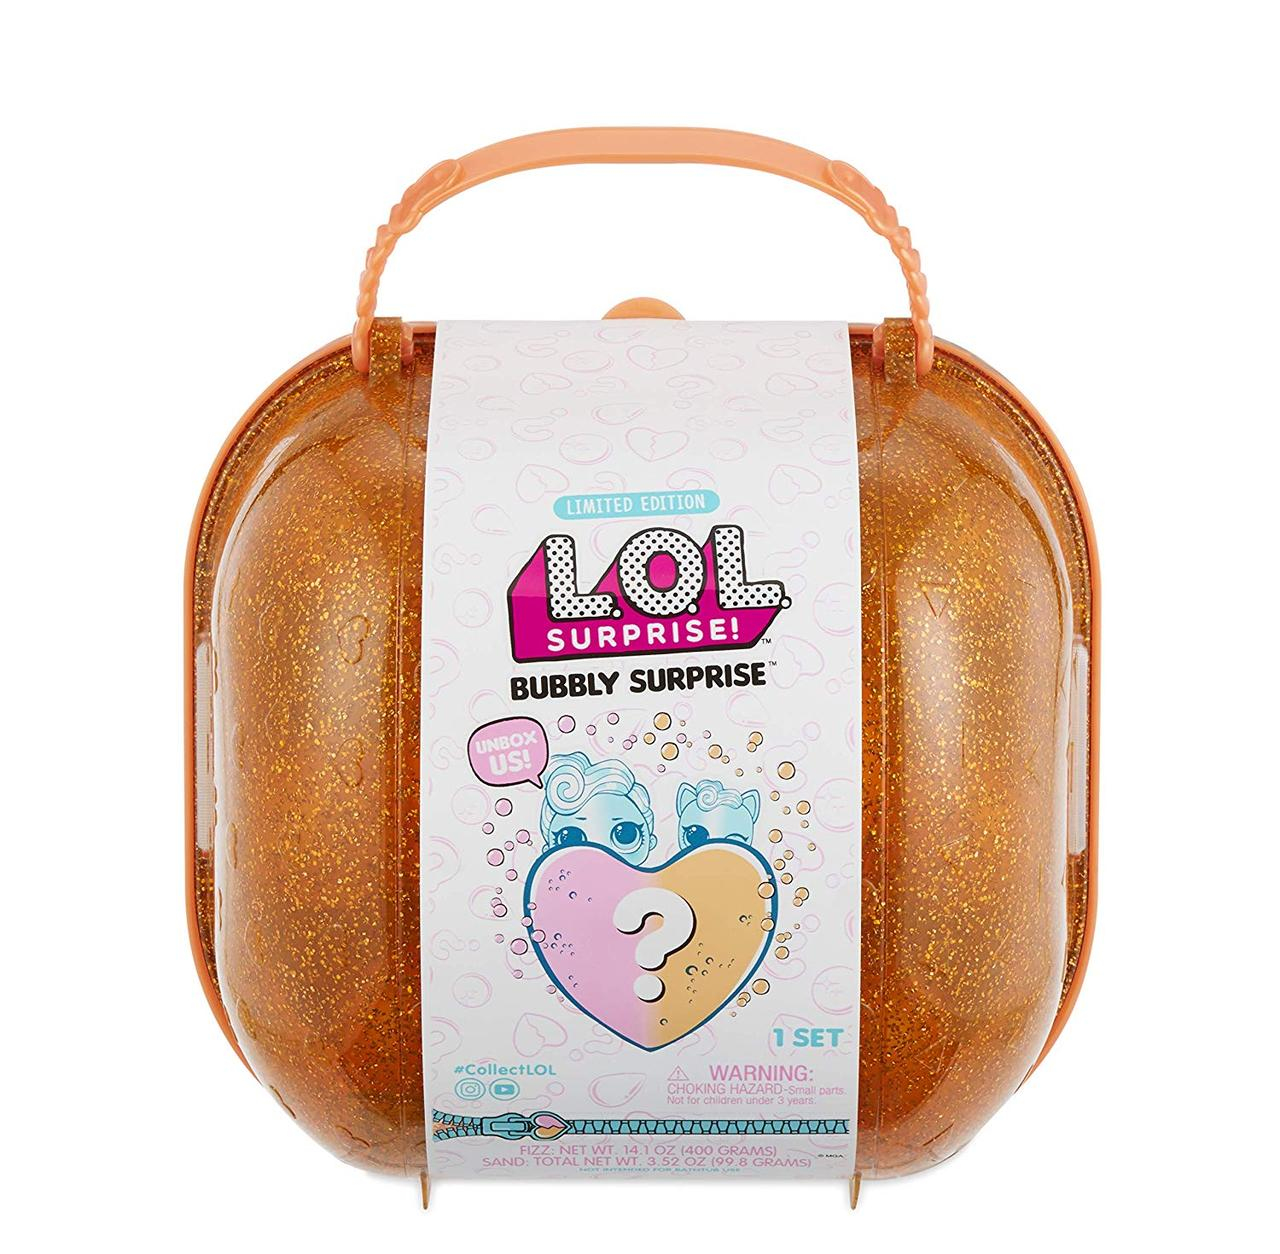 LOL BUBBLY SURPRISE™ (шипучий сюрприз) чемоданчик оранжевый